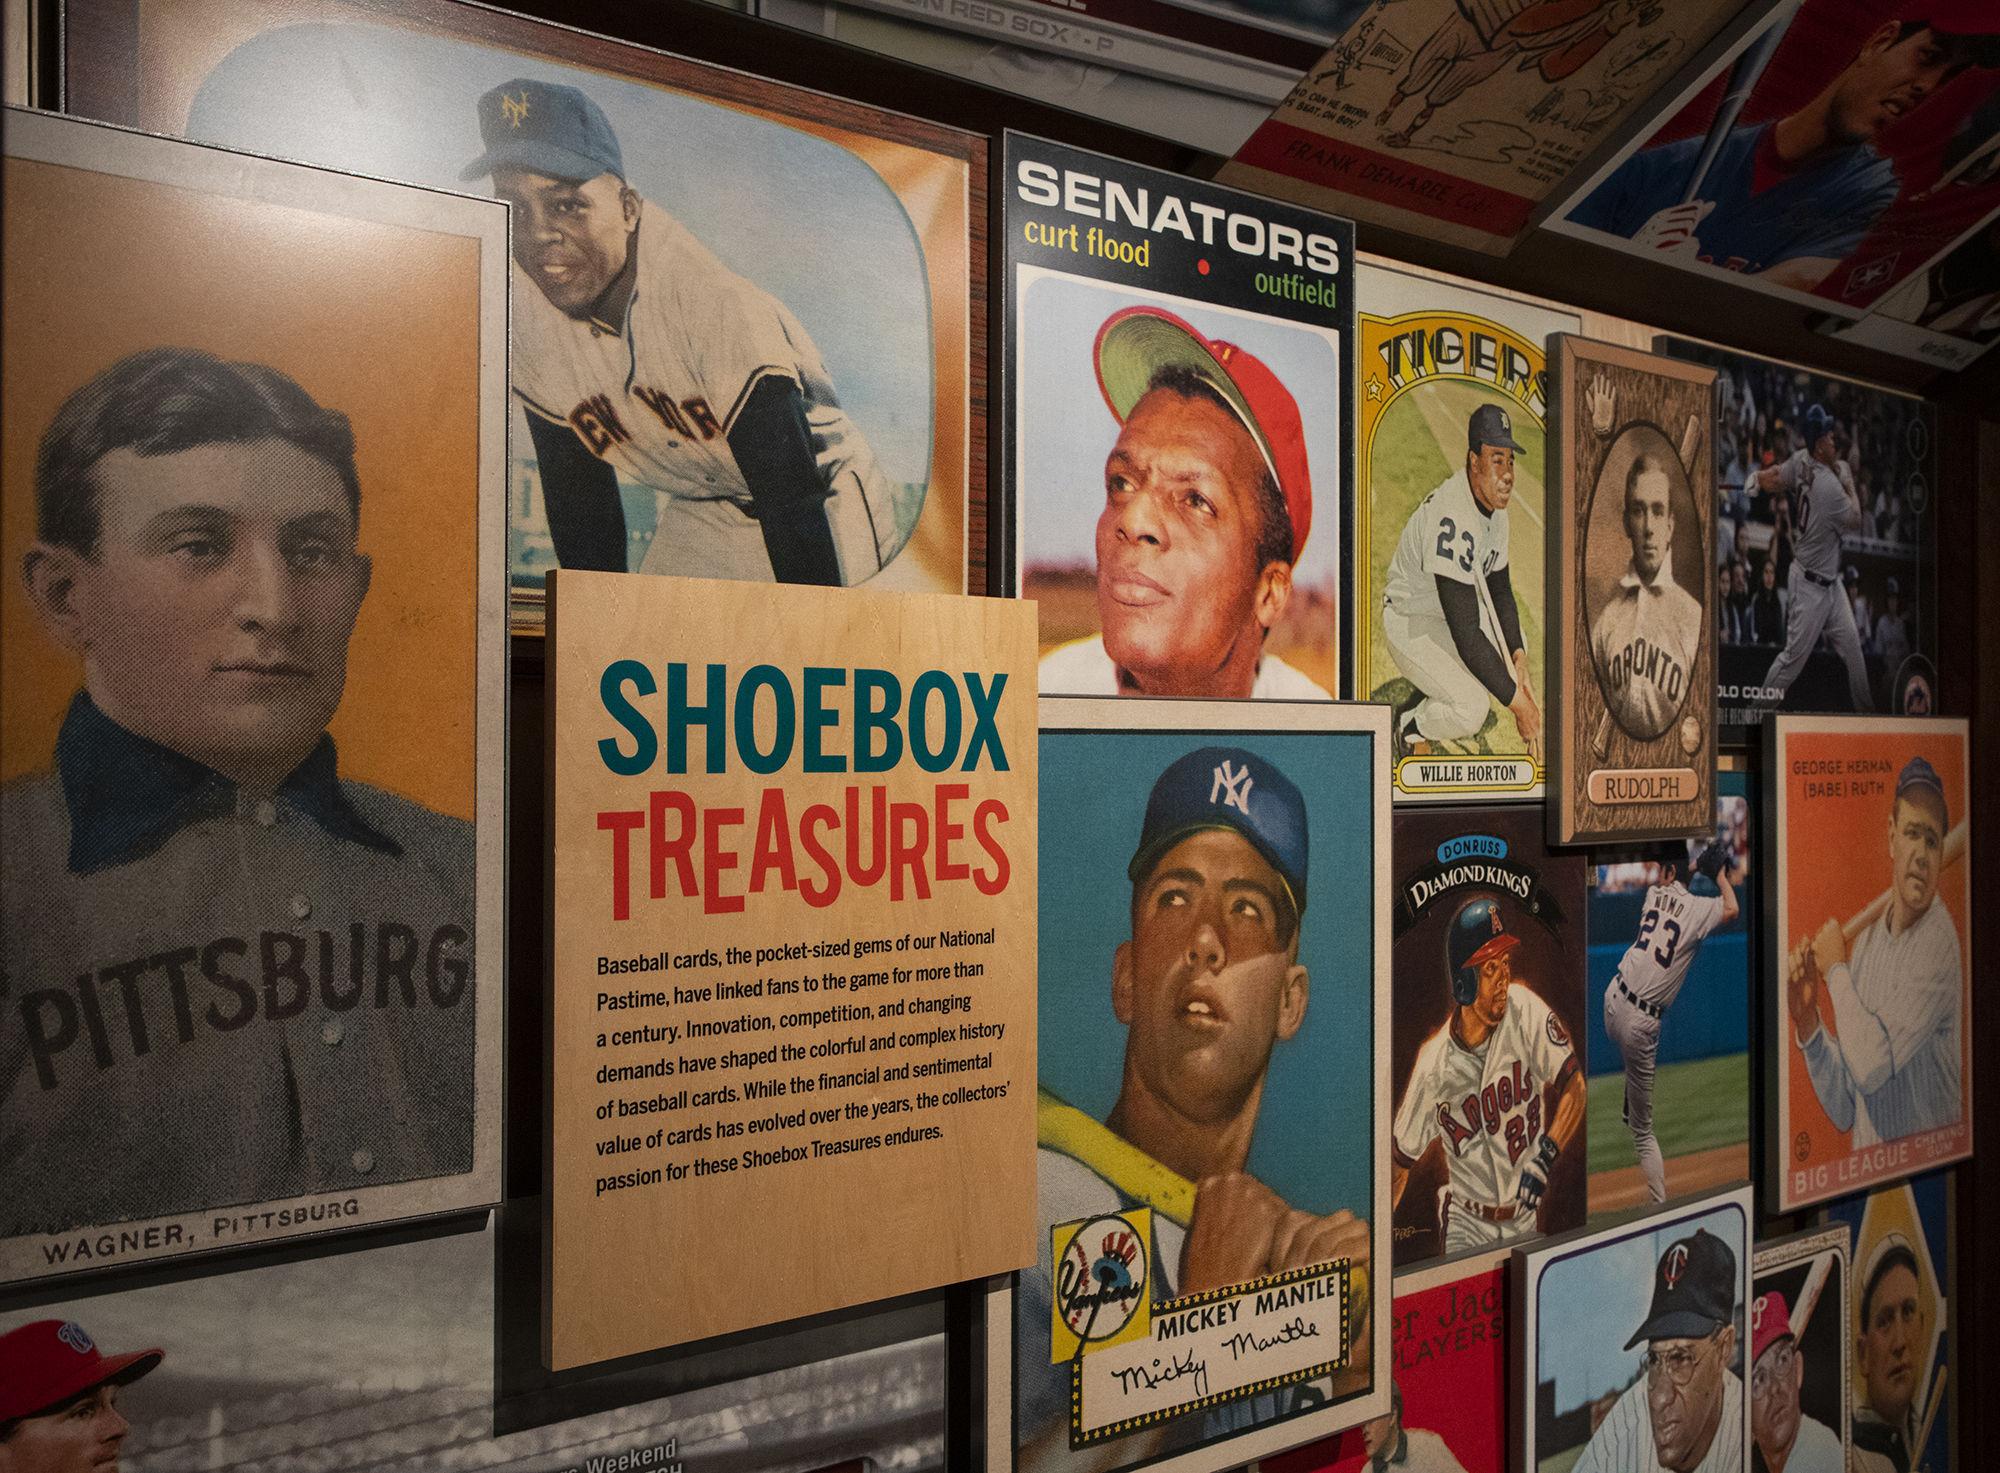 Museums Shoebox Treasures Exhibit Tells The Story Of Baseball Card